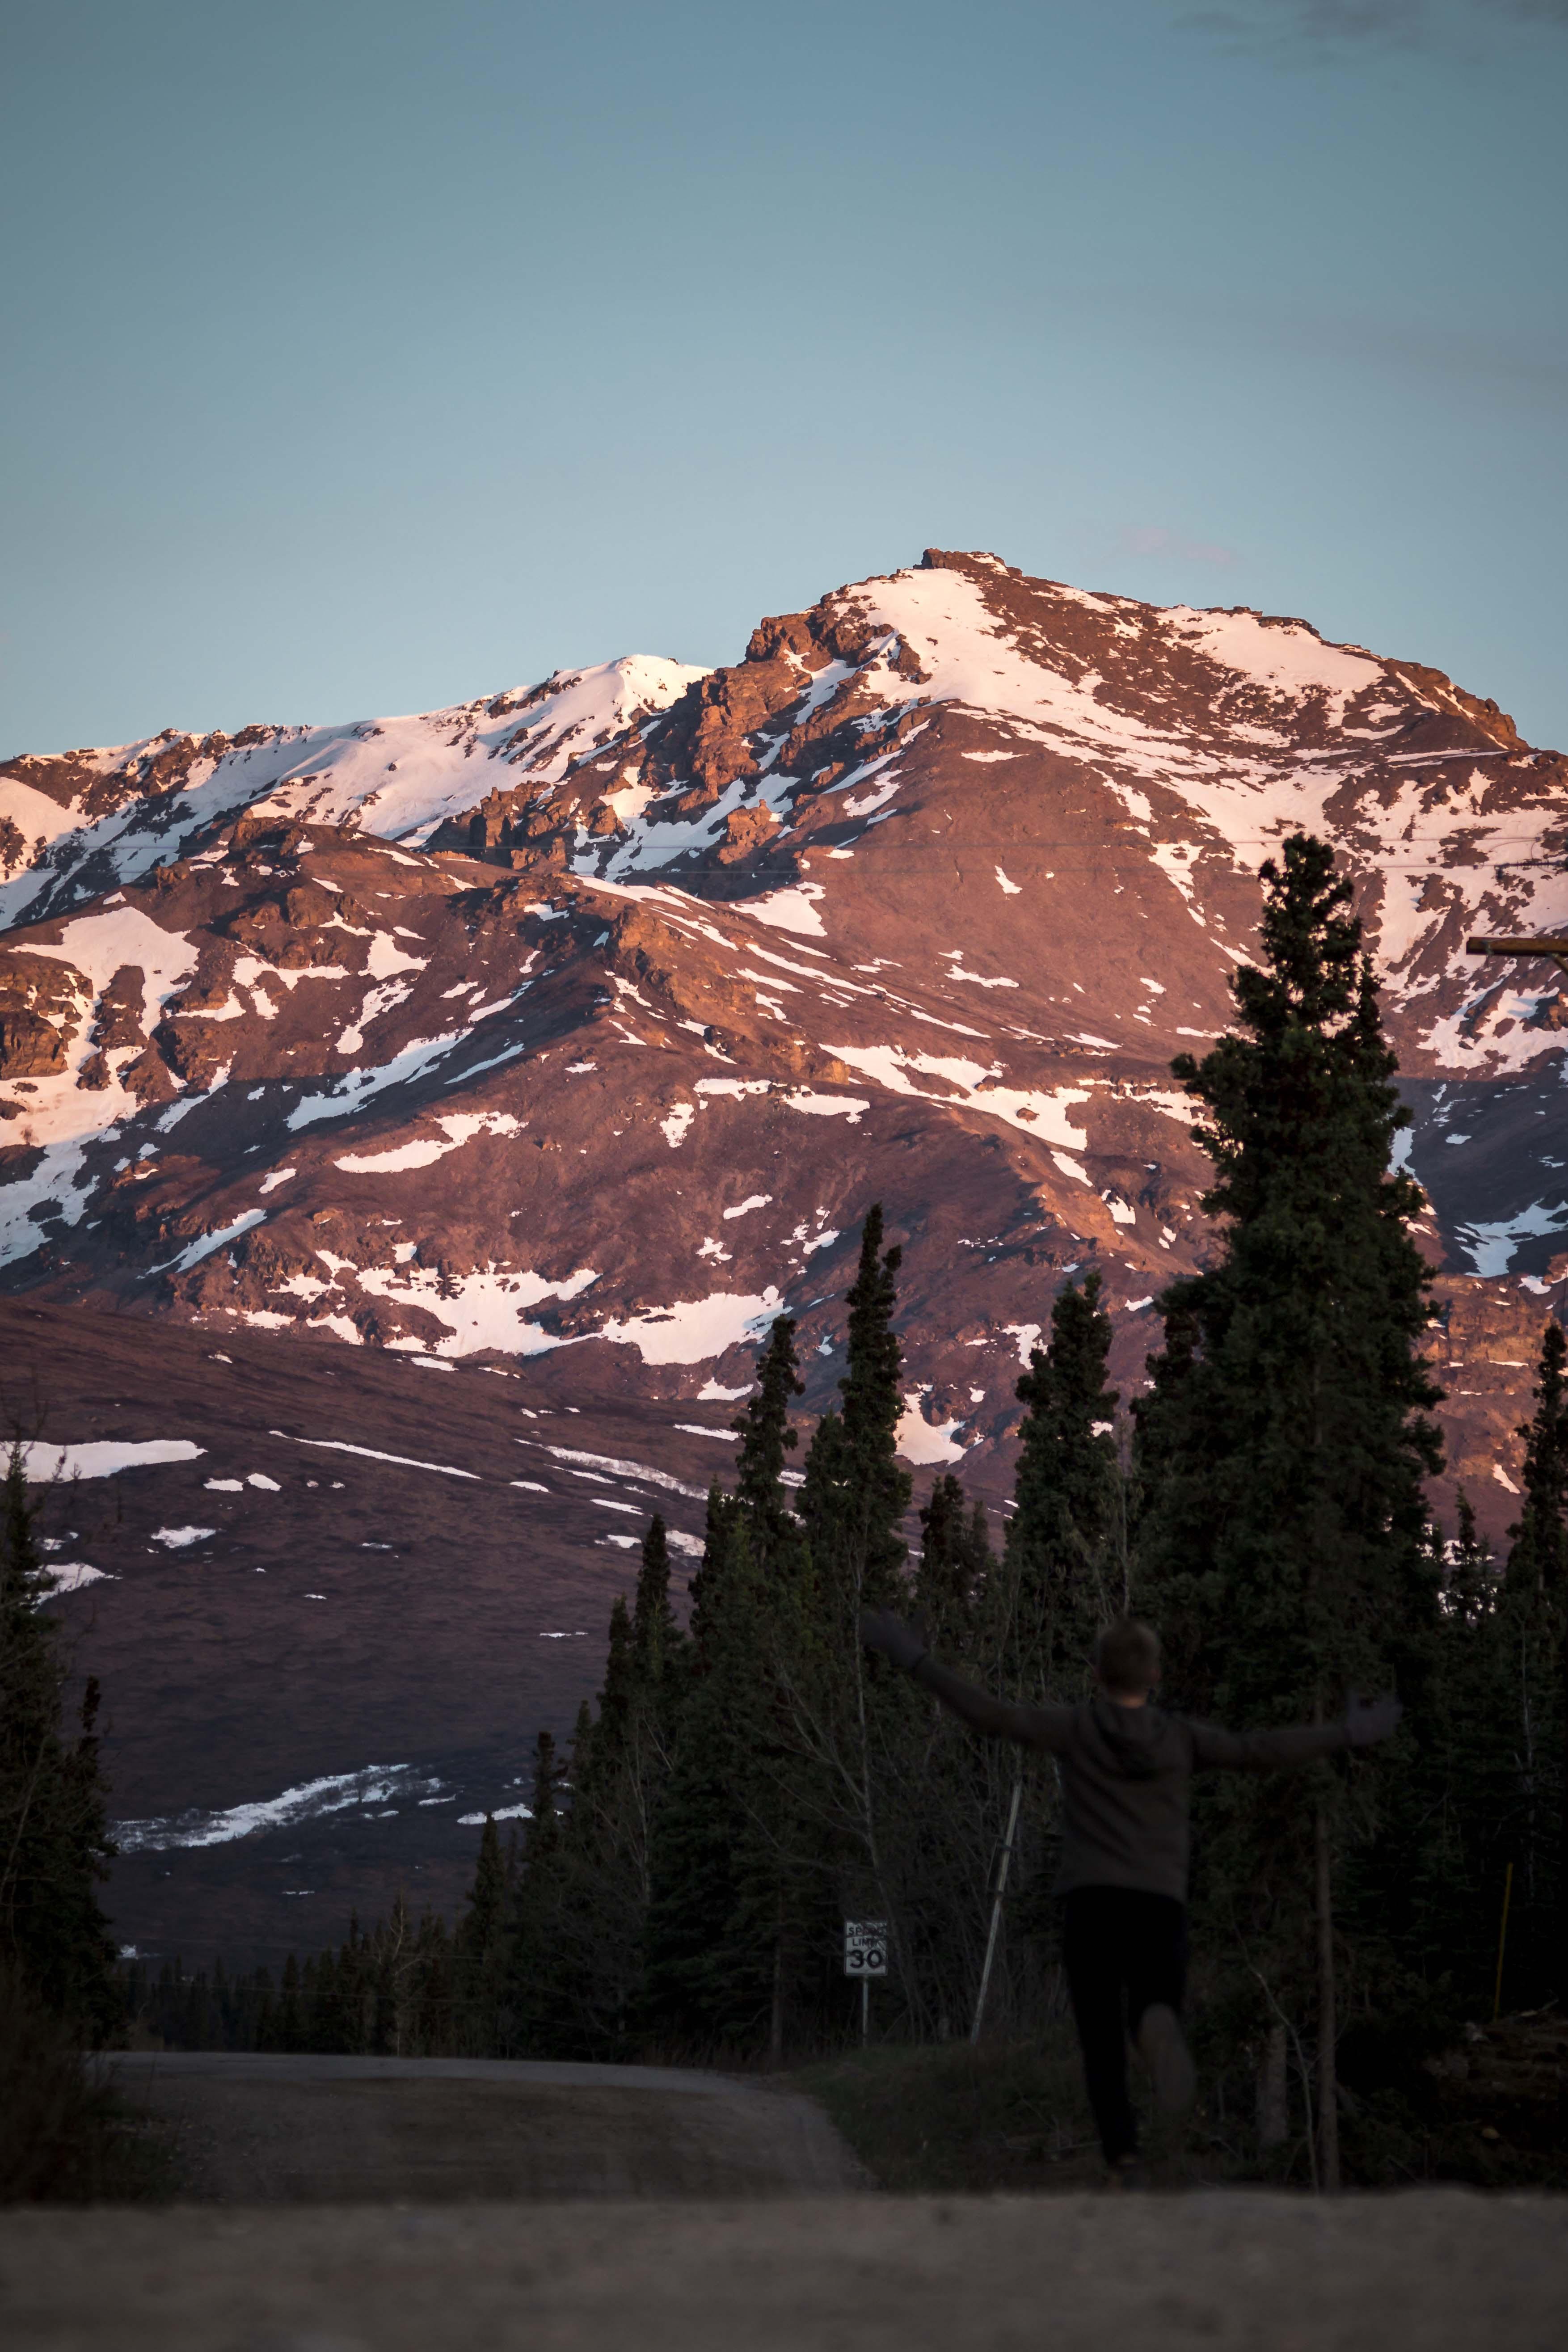 photo of brown mountain near trees